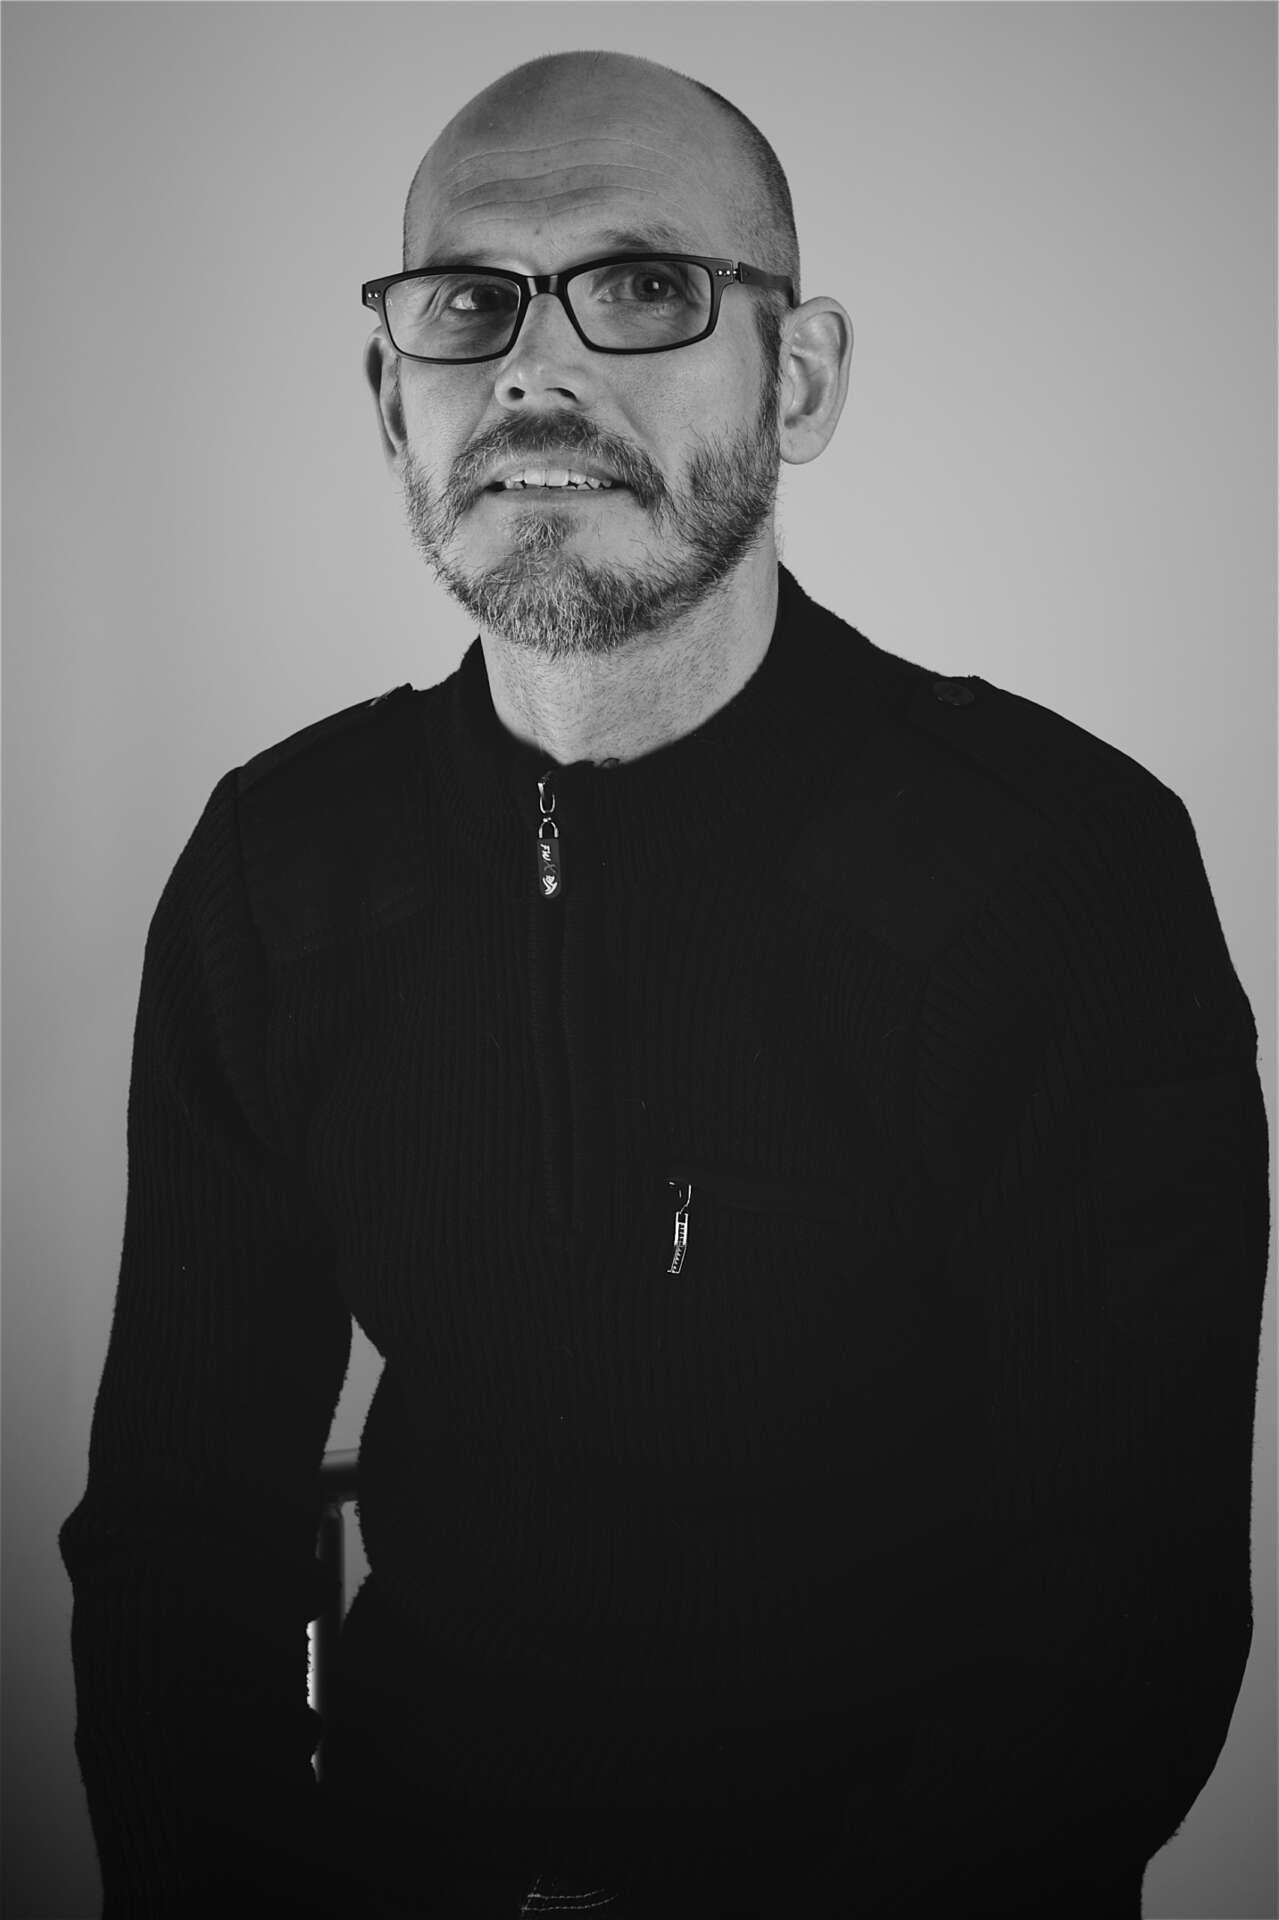 Niklas Wiberg